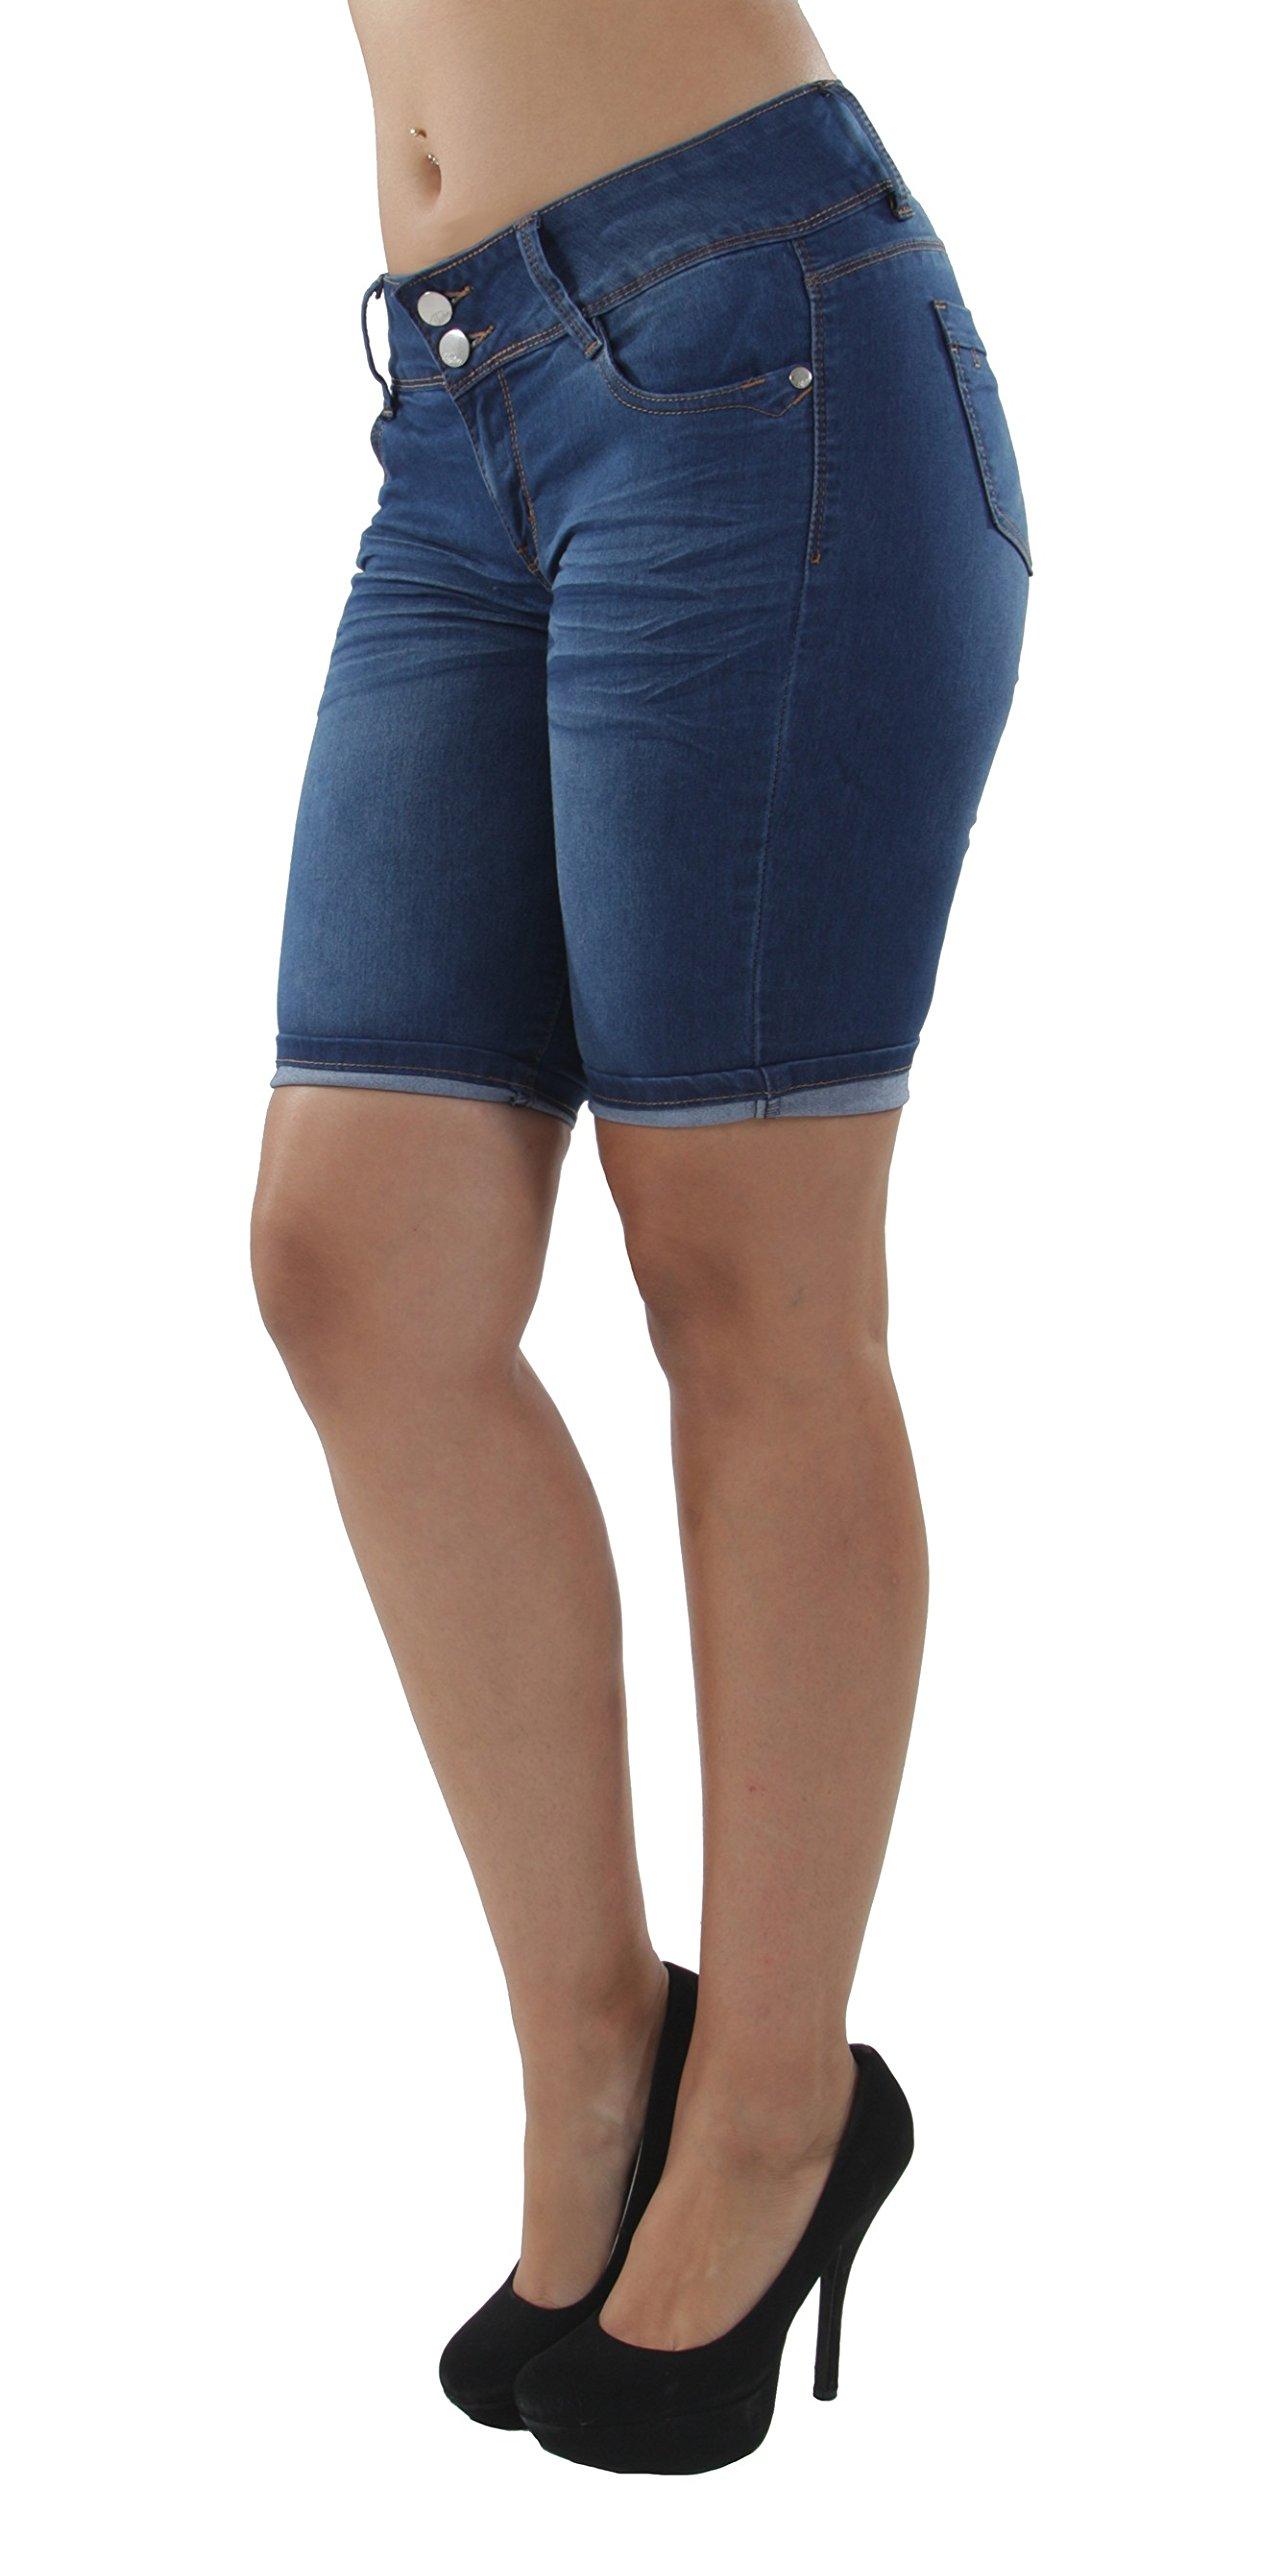 9Y128MB - Plus Size, Classic Premium Denim, Bermuda Shorts in M. Blue Size 18